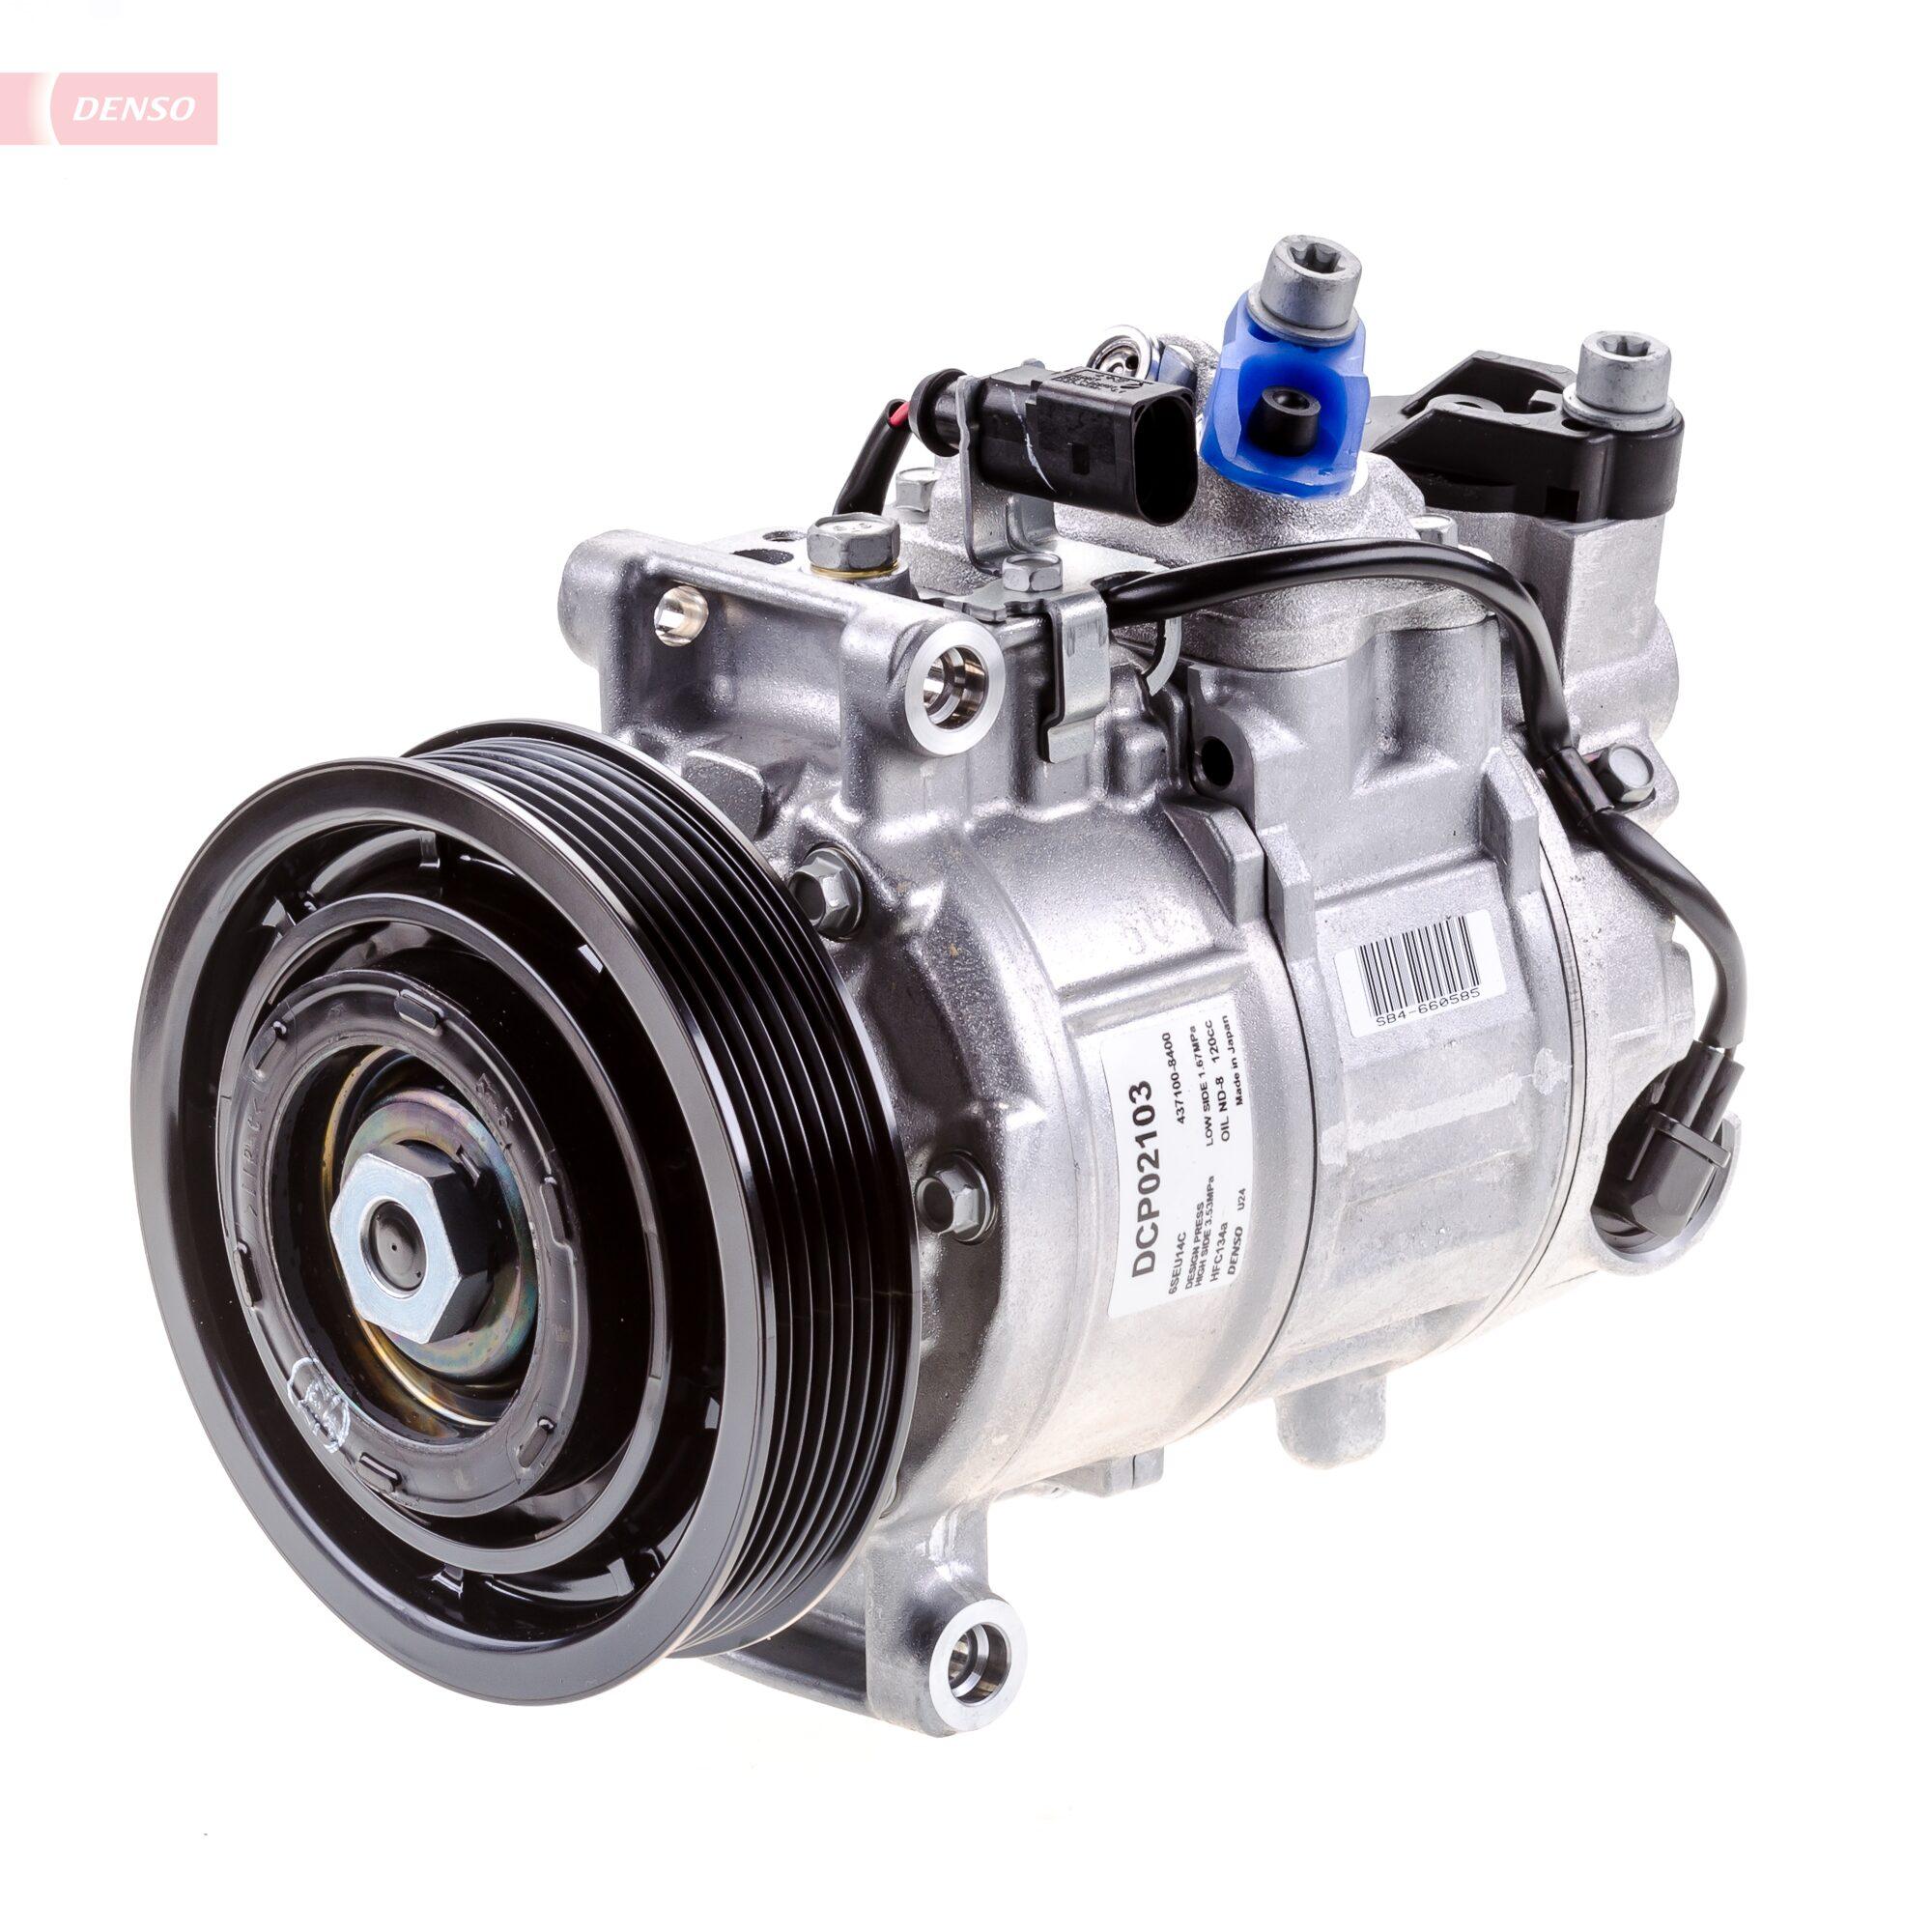 Kompresor klimatizace DENSO DCP02103